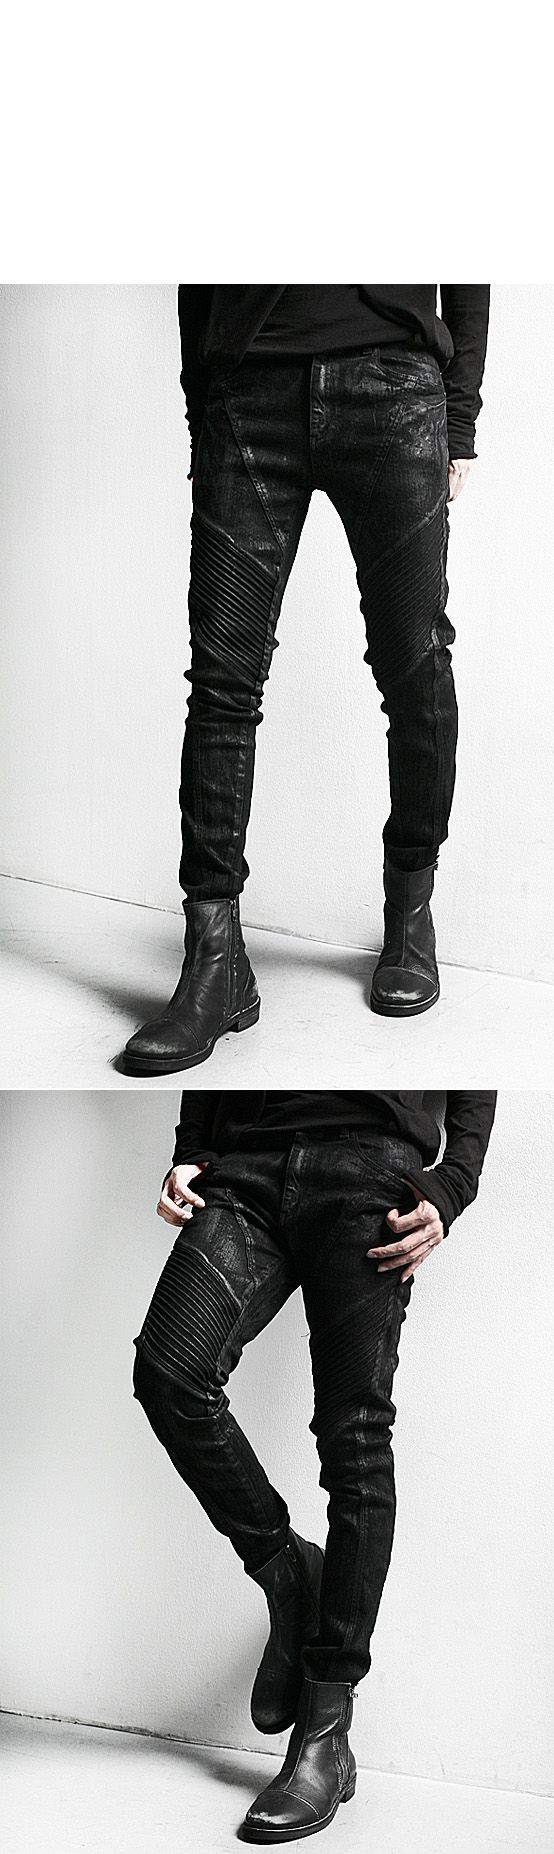 Bottoms :: Dark Cloud Washing Skinny Black Biker Jean - 64 - New and Stylish - Fast Mens Fashion - Mens Clothing - Product